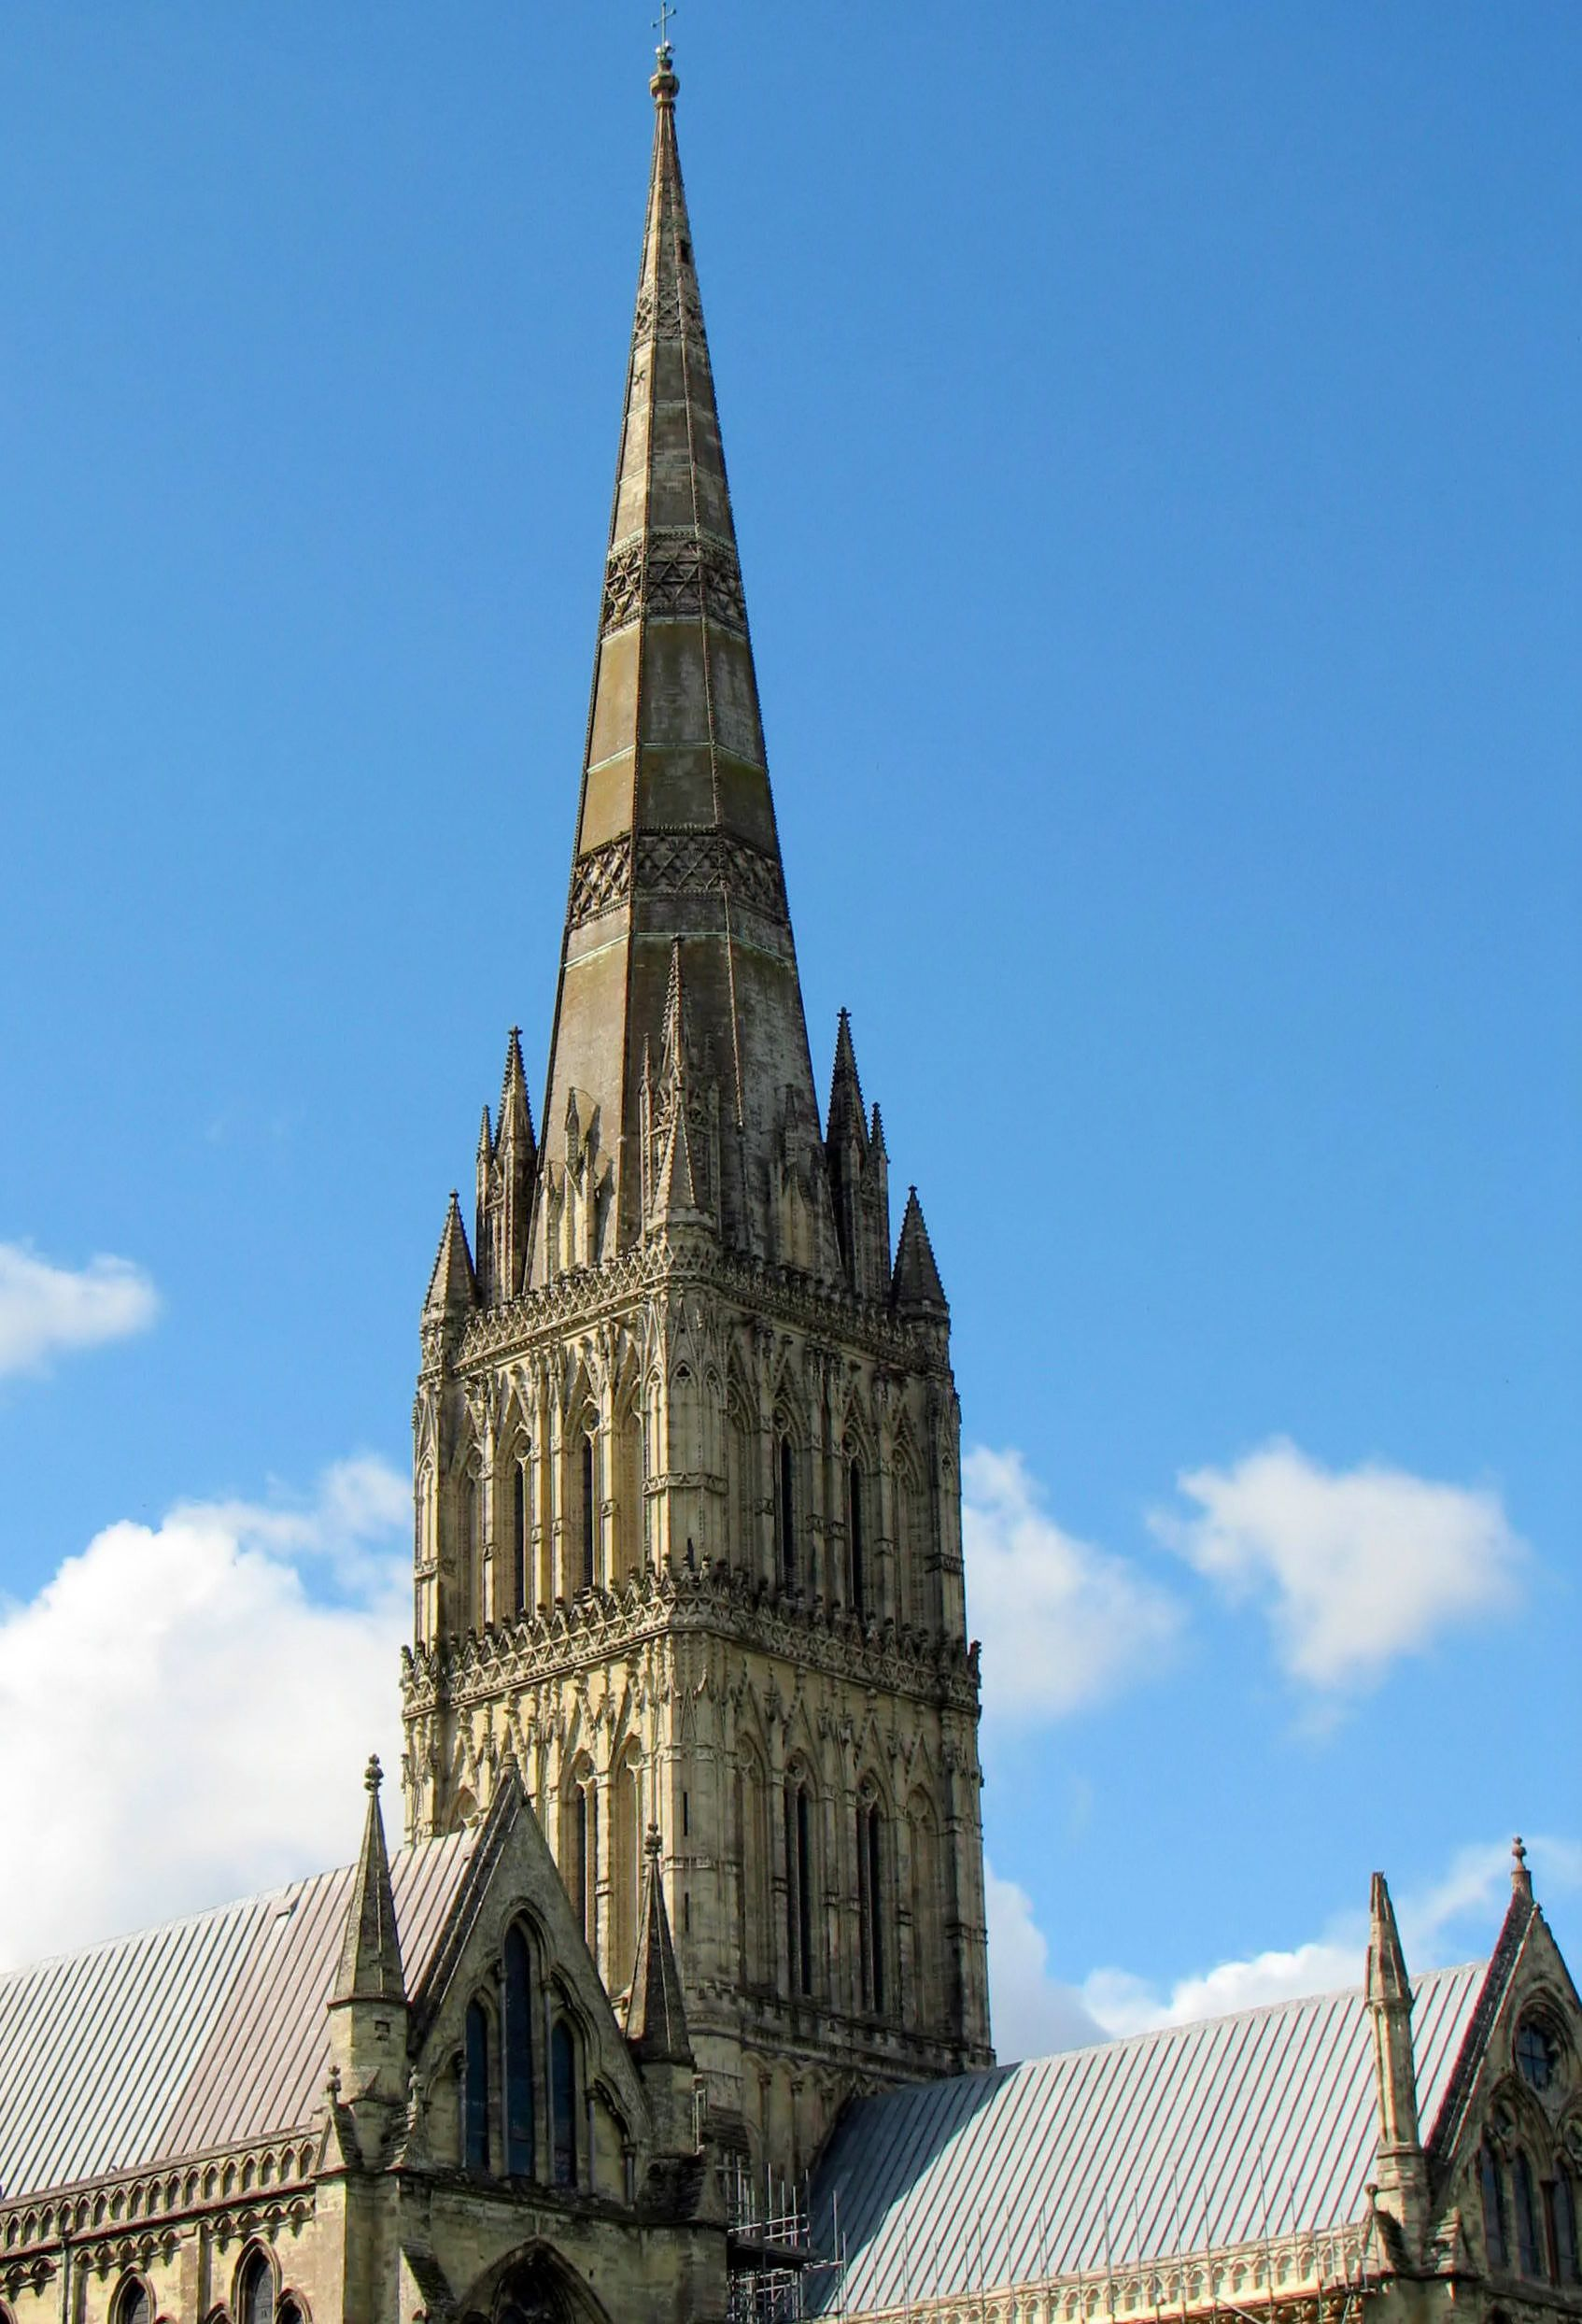 salisbury cathedral - photo #38